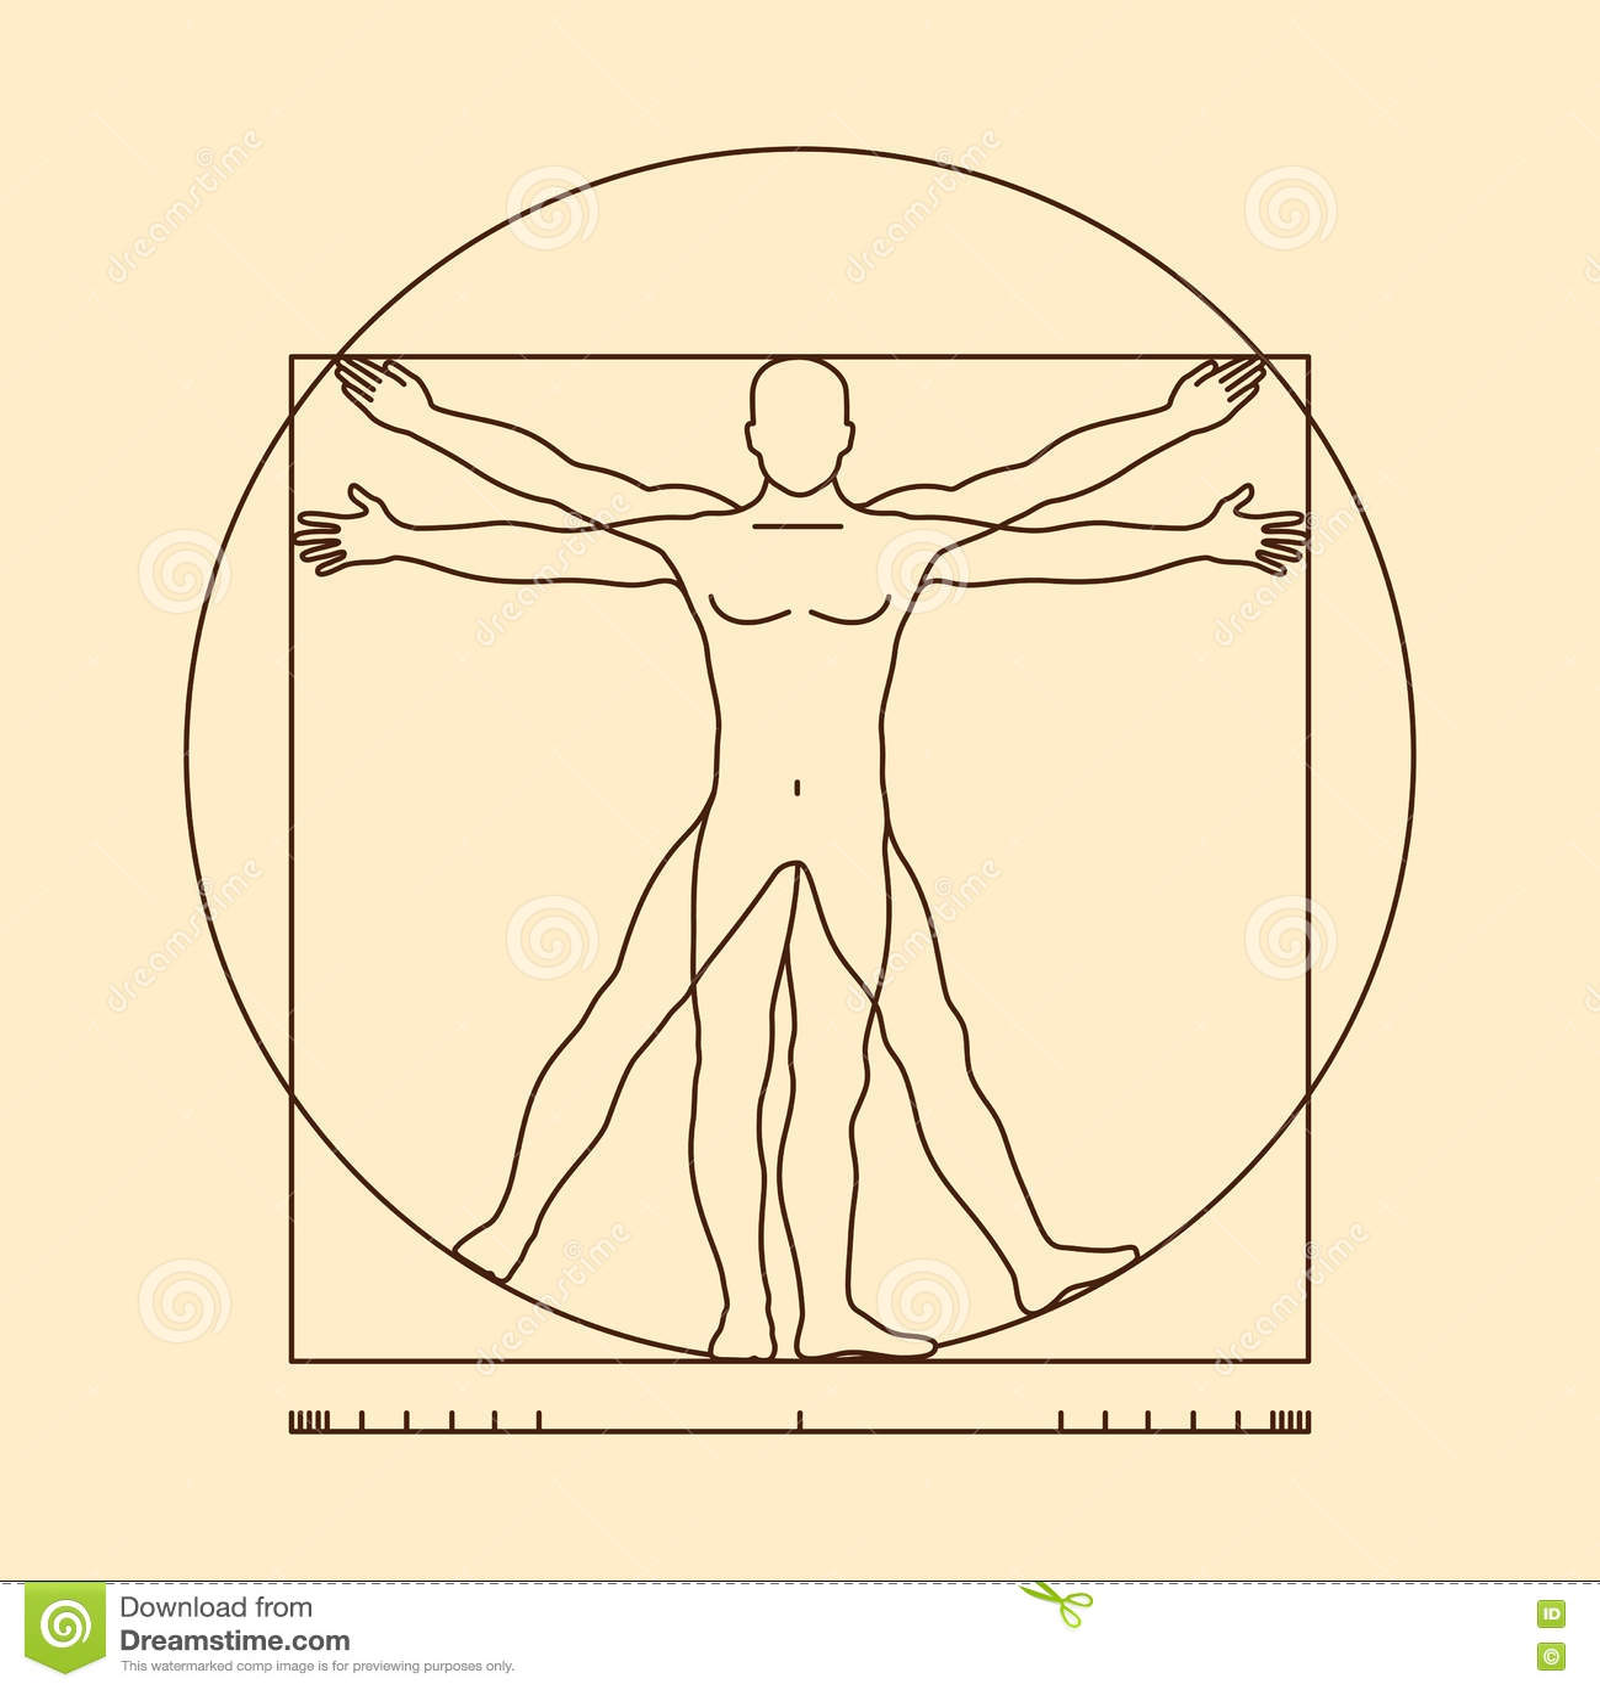 Leonardo Da Vinci Vitruvian Man Vector Illustration Stock Vector ...